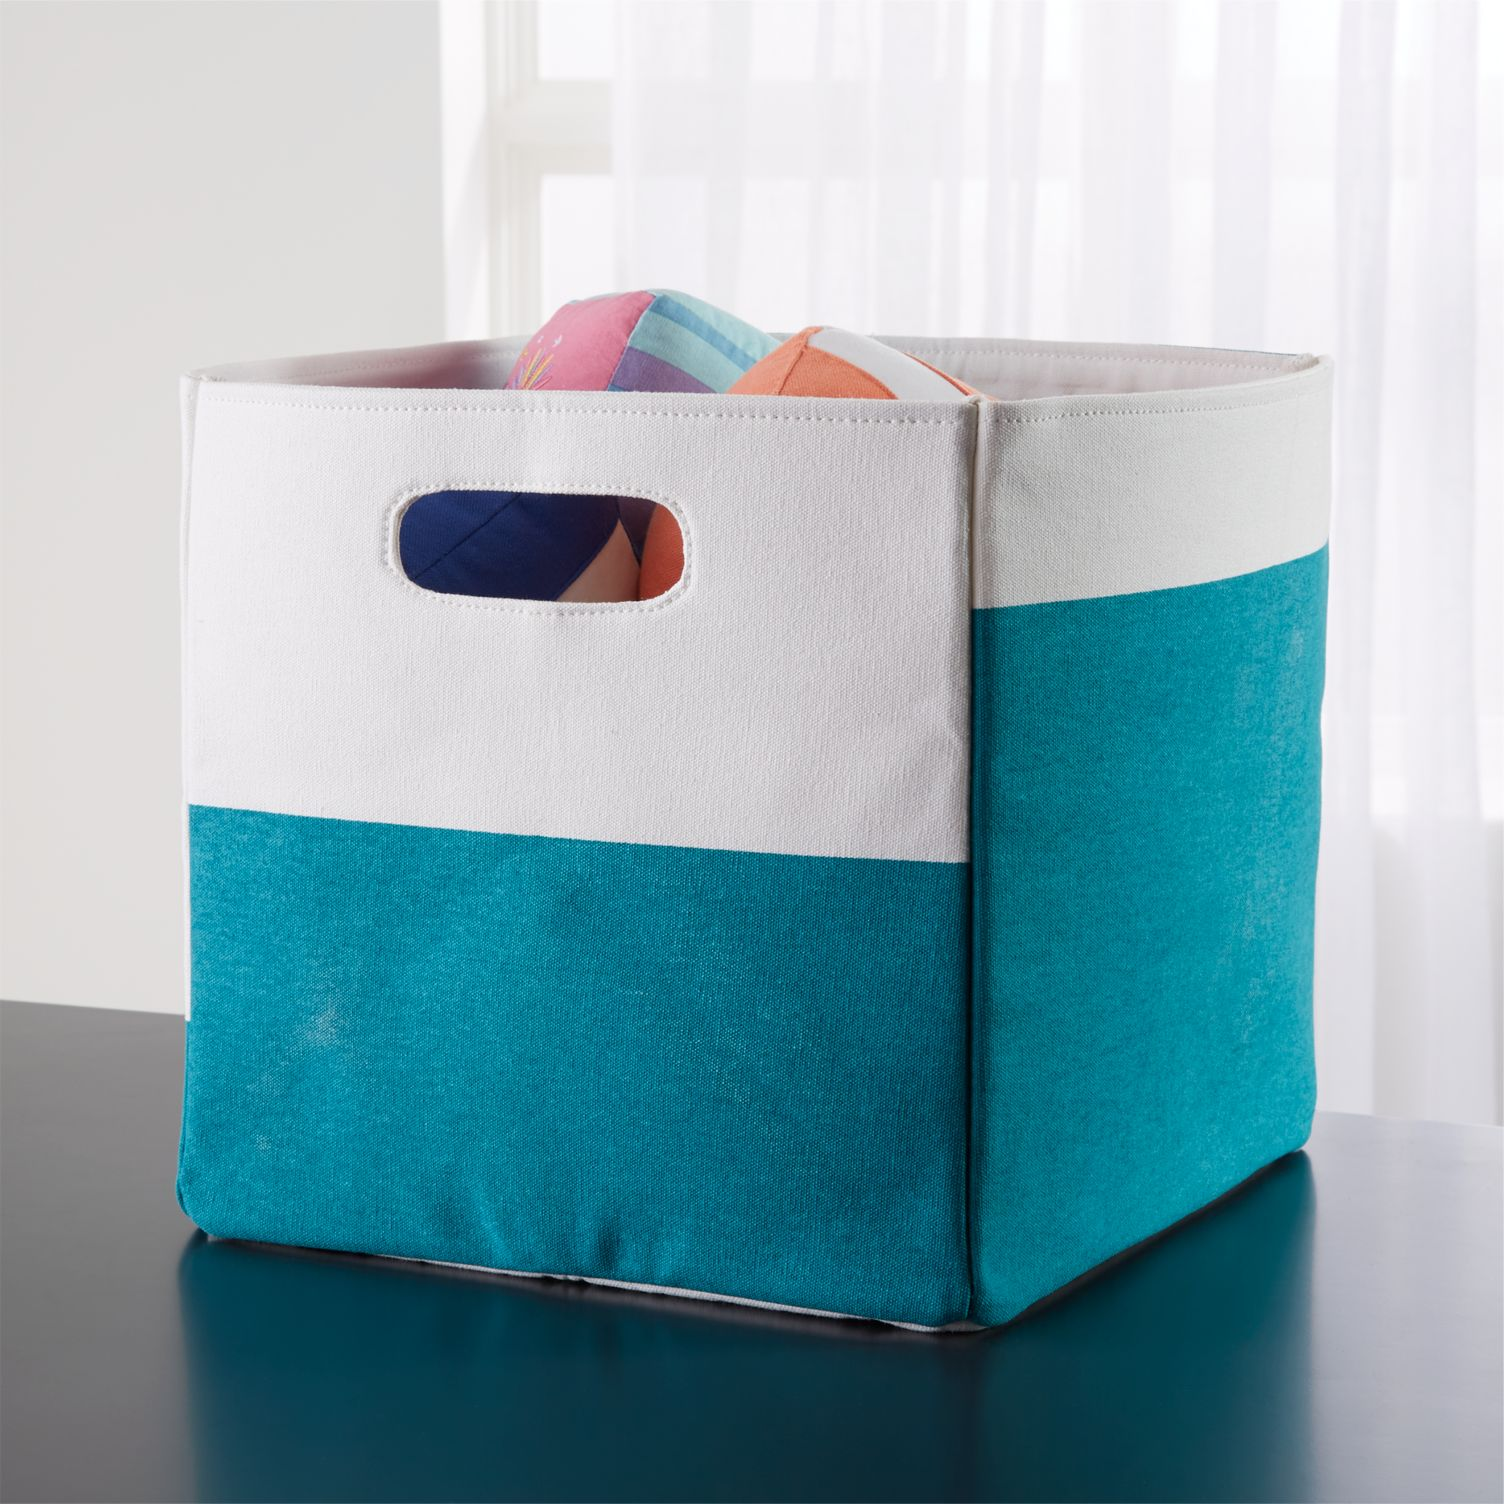 Teal cube storage bin